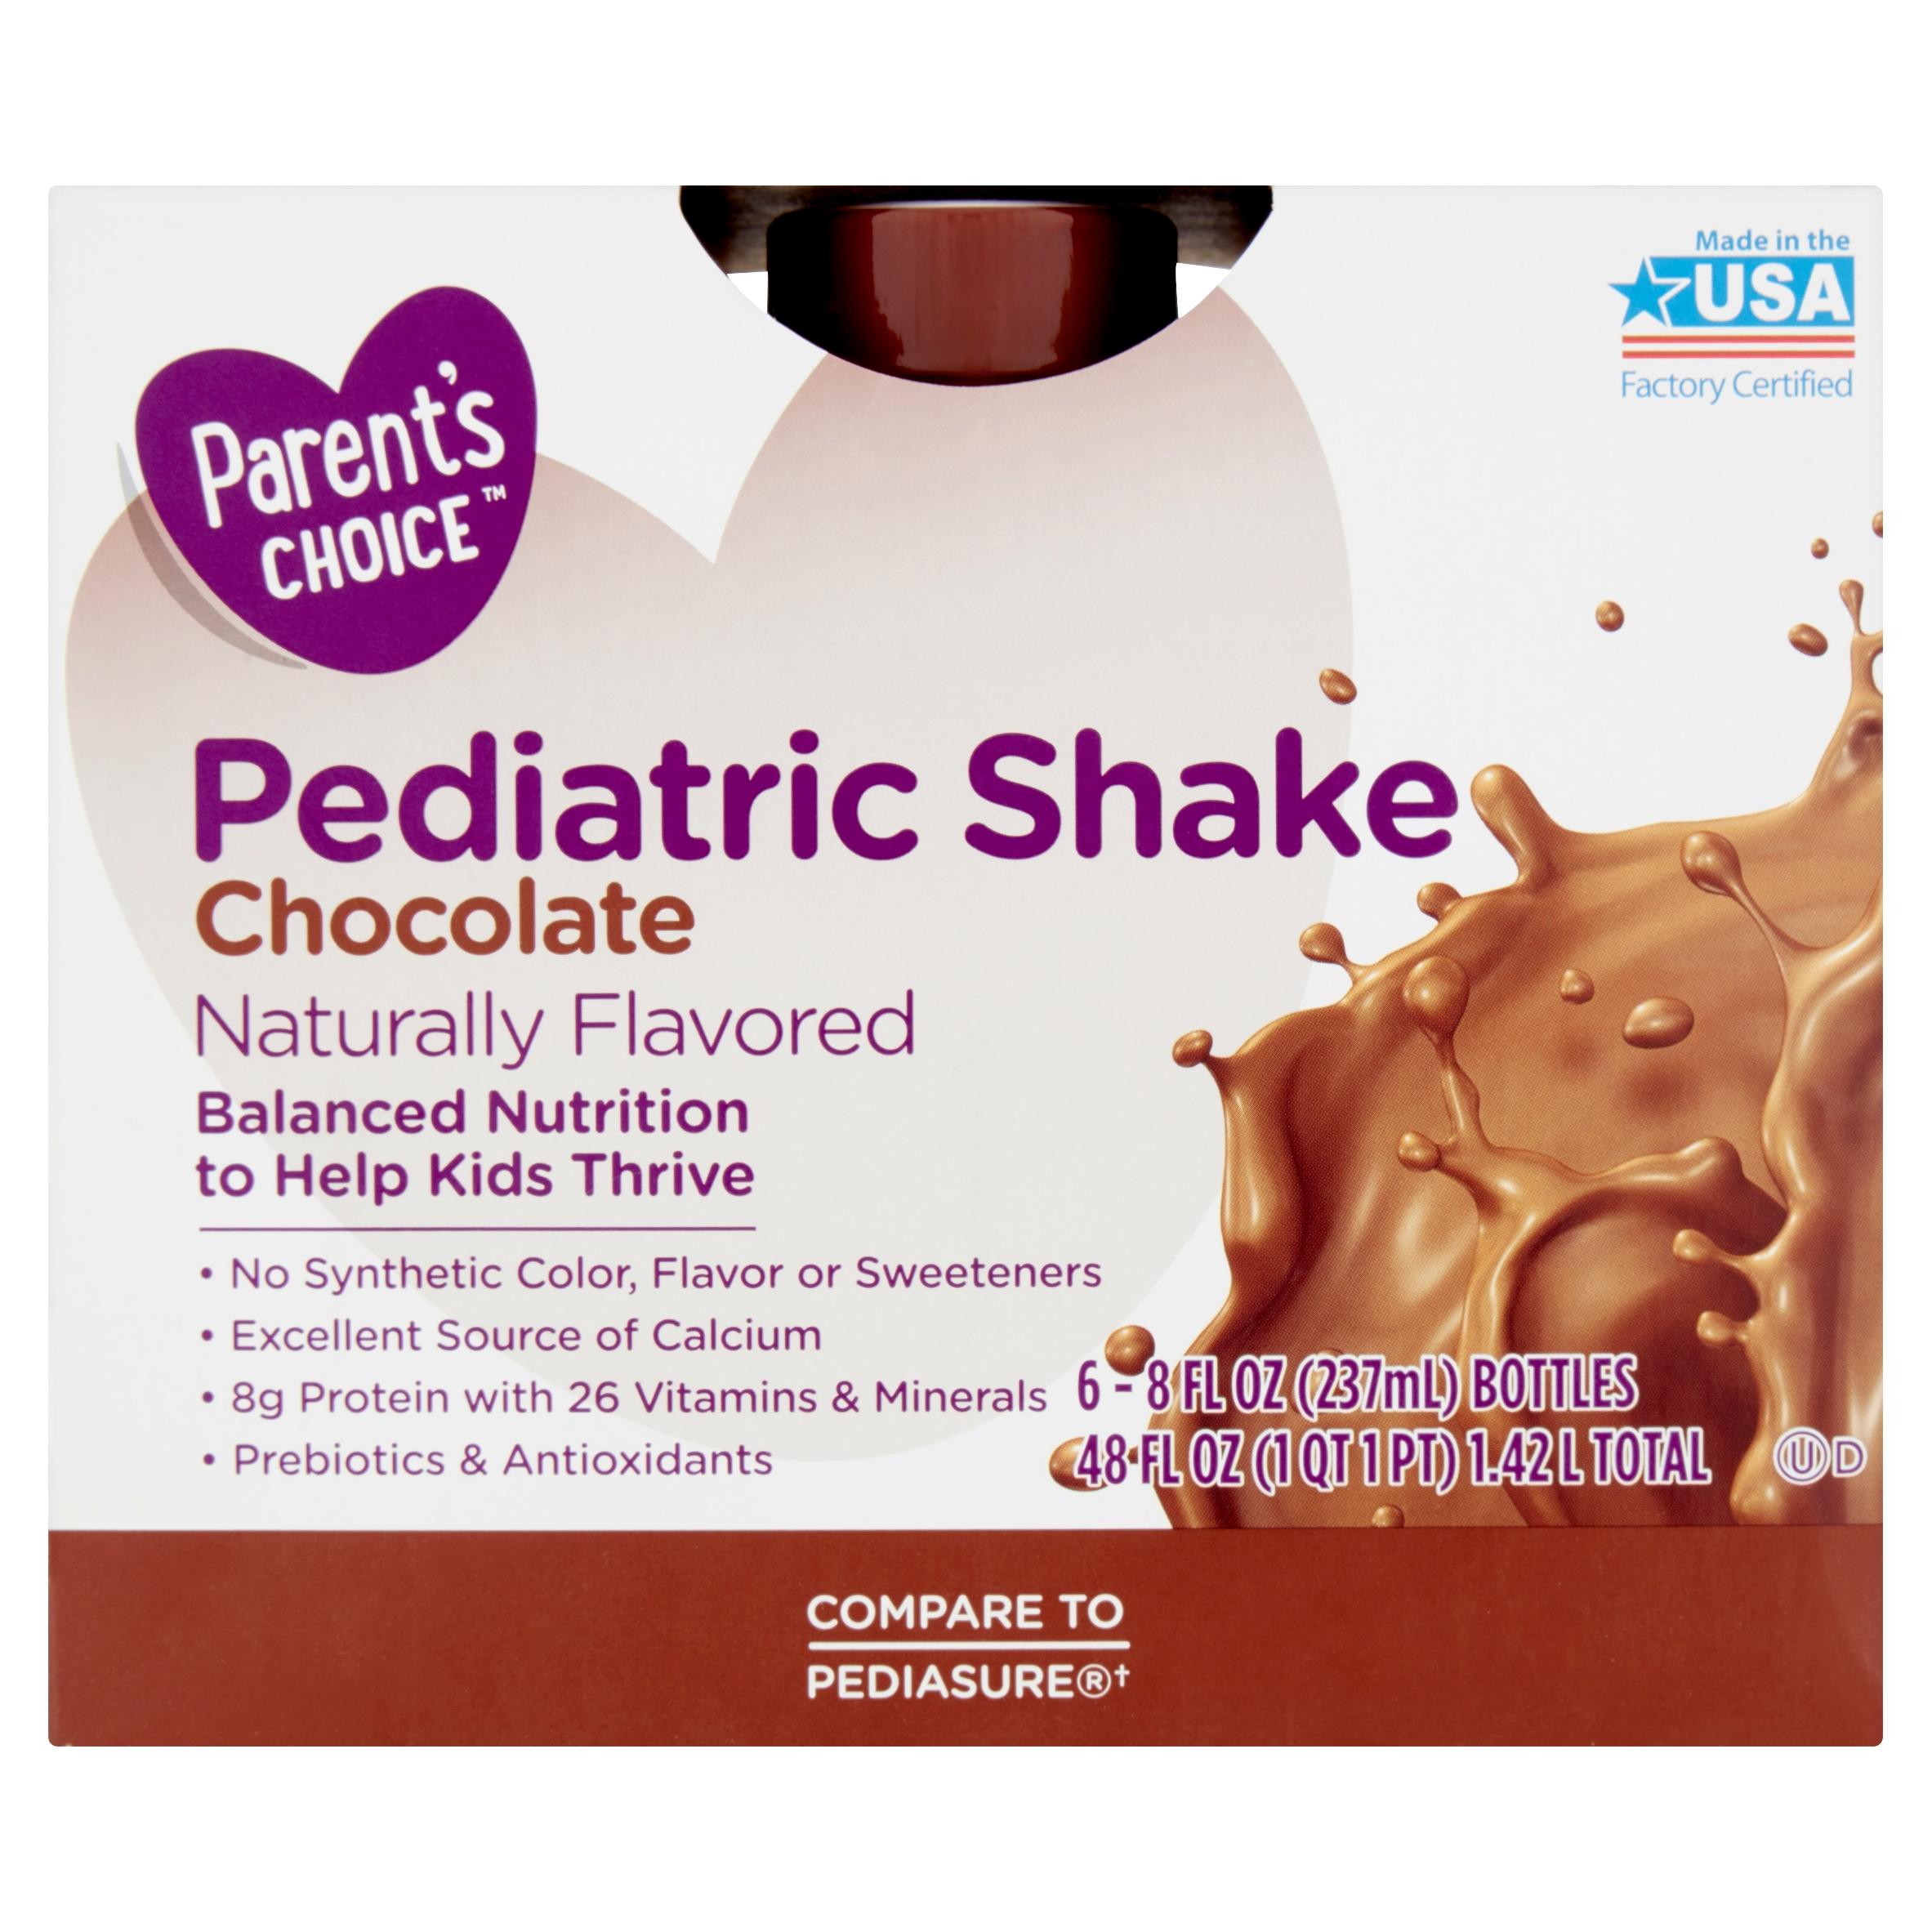 Parent's Choice Chocolate Pediatric Shake, 8 fl oz, 6 count